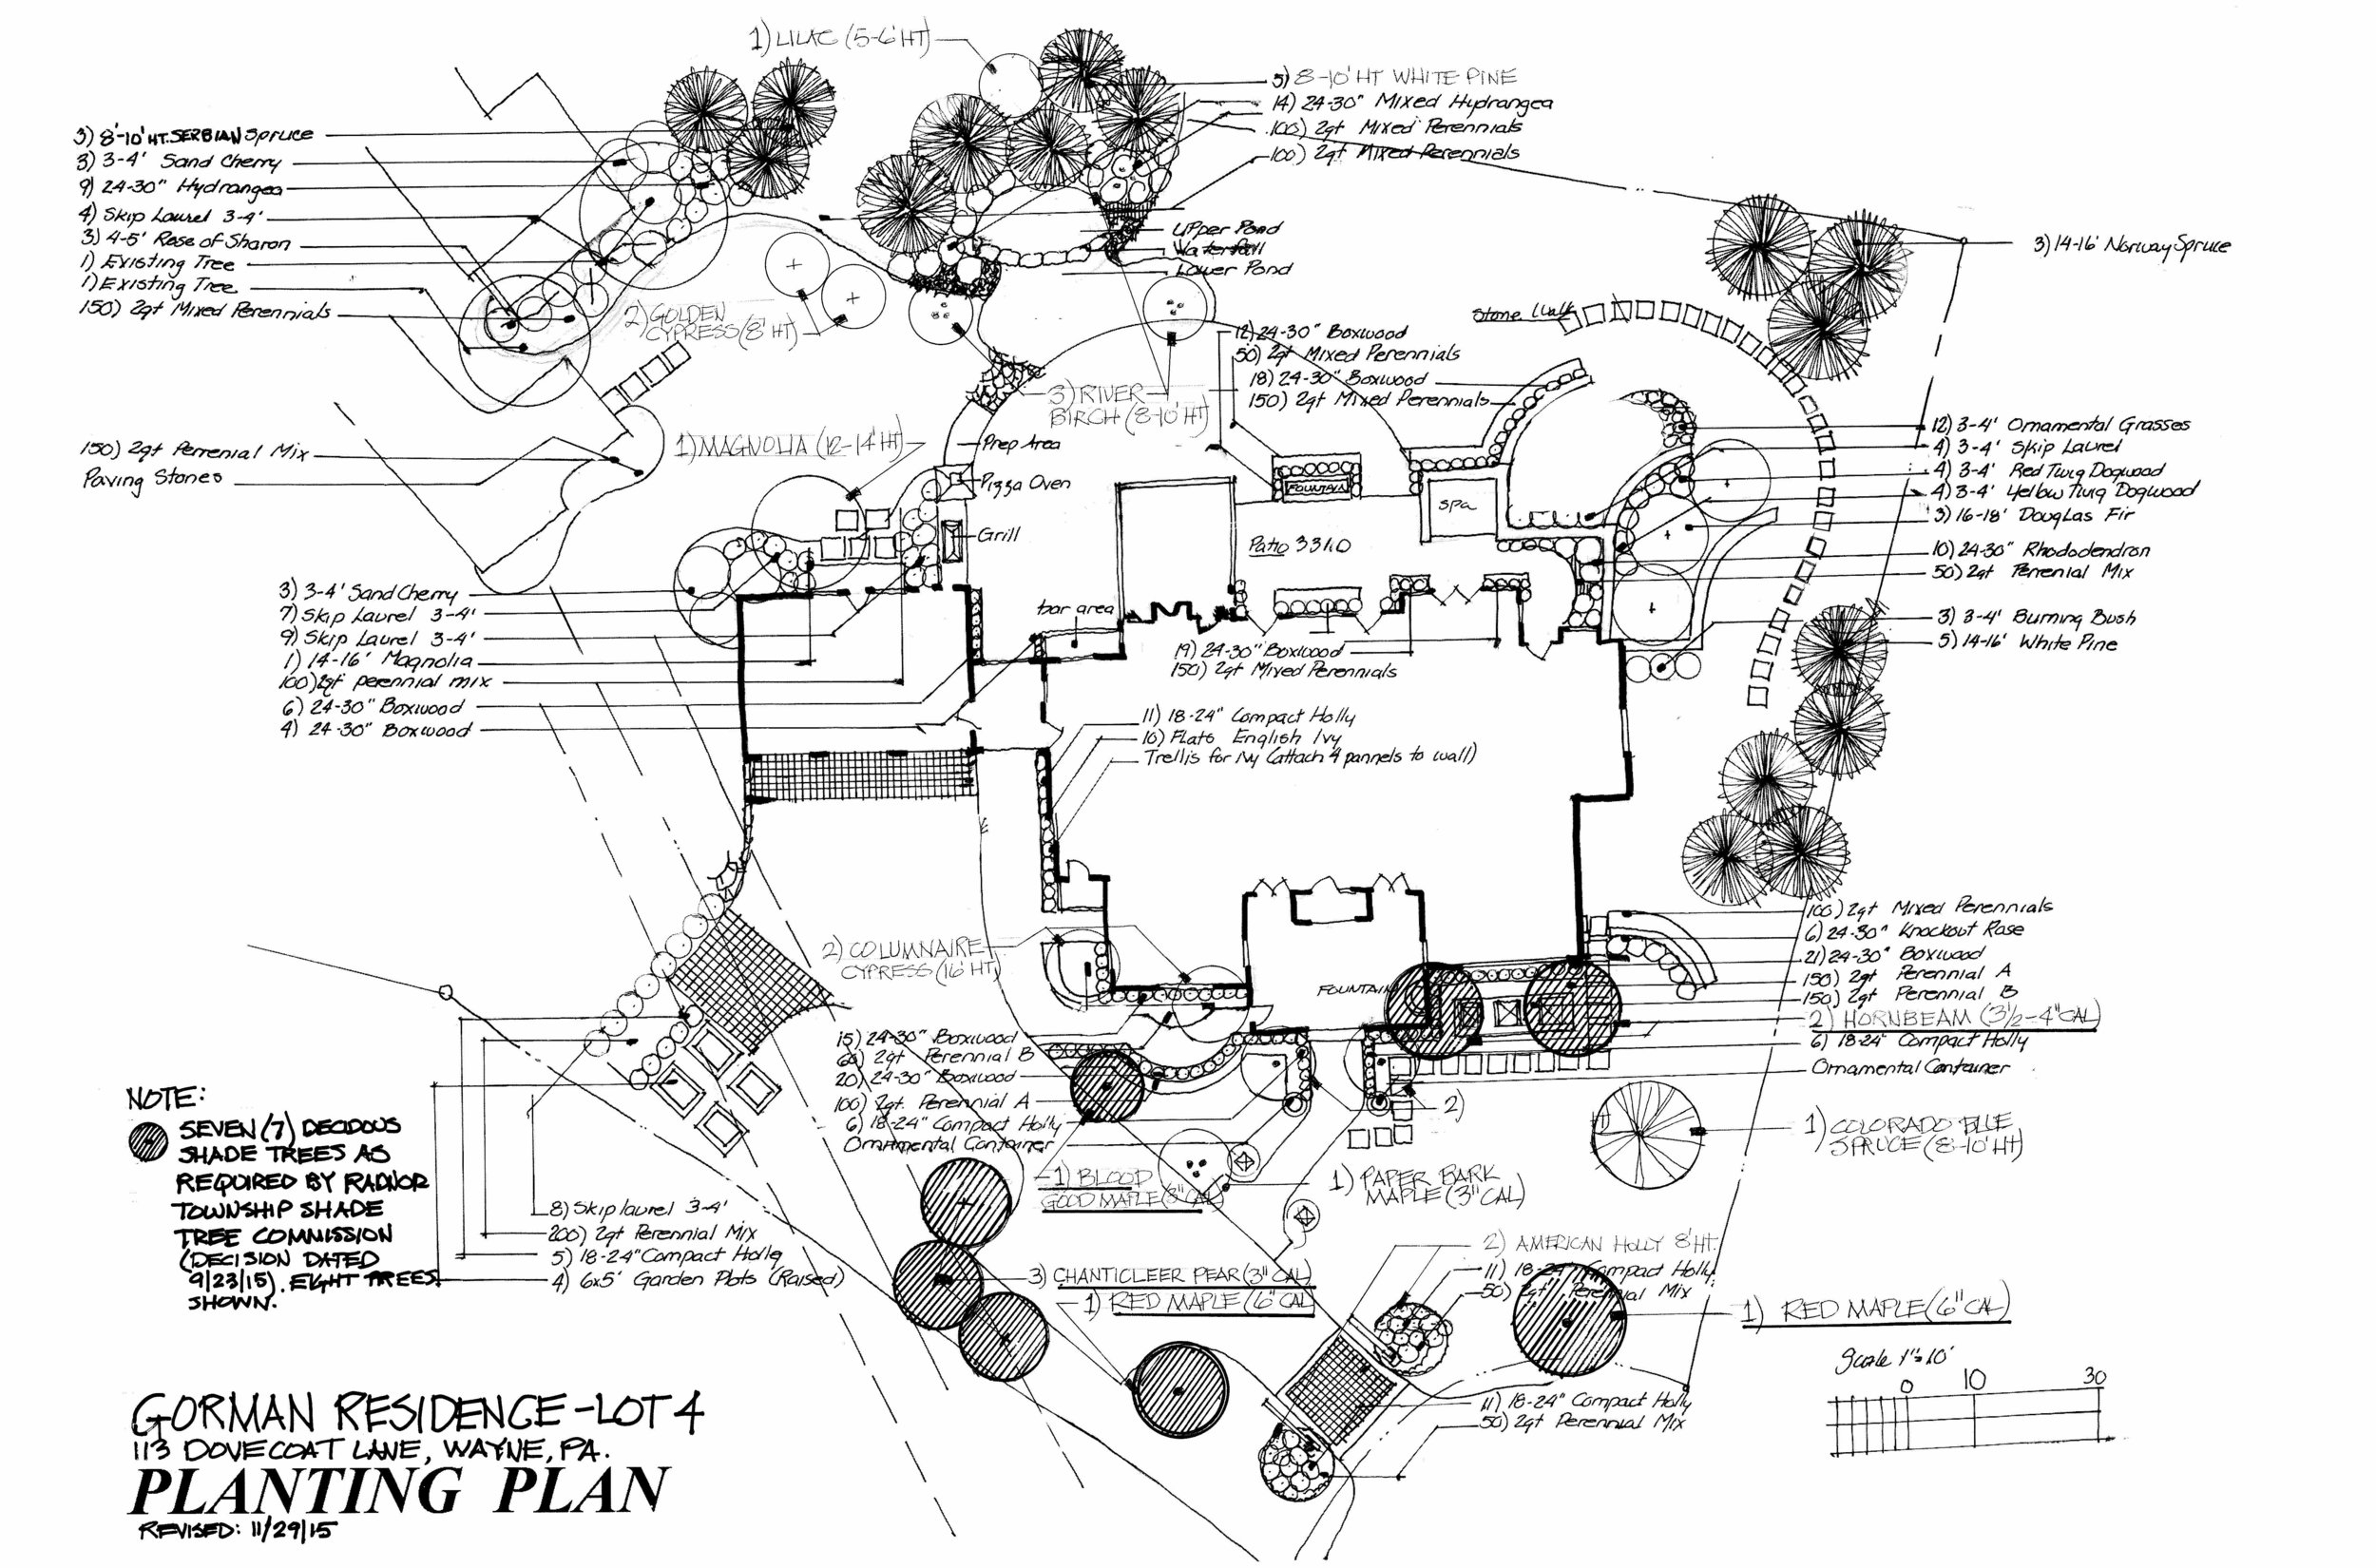 11-19-15 Revised Planting Plan.jpg